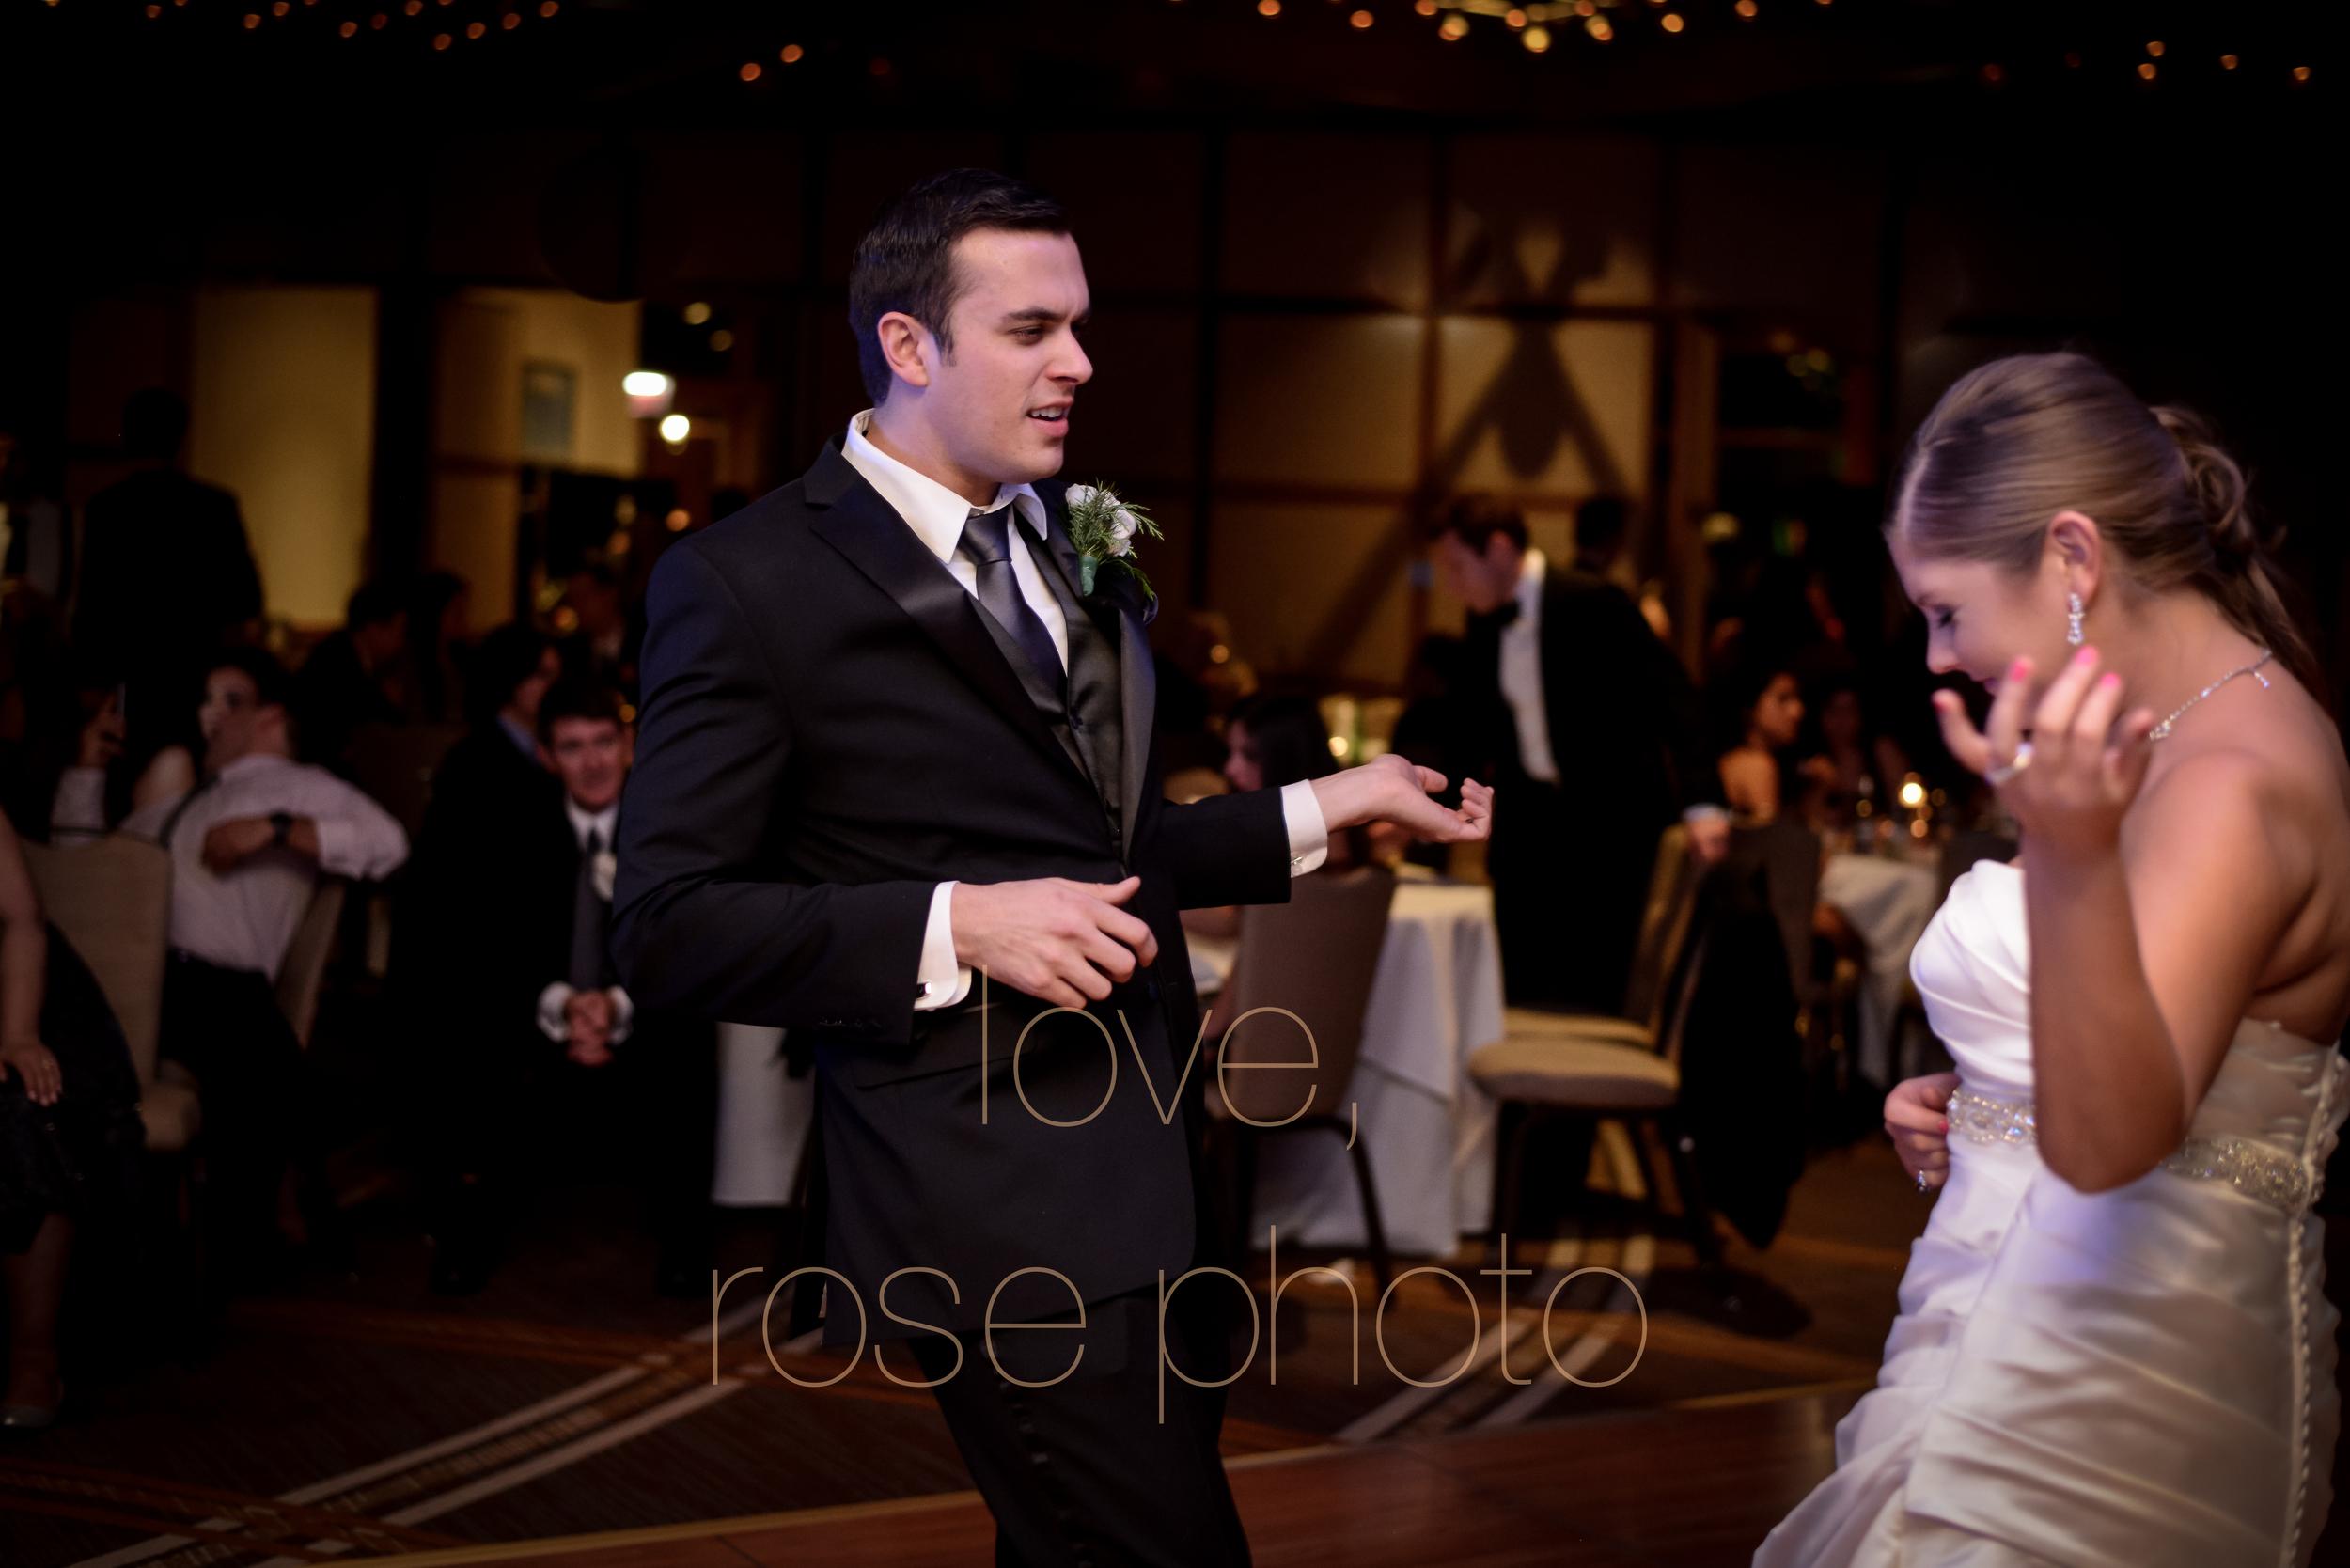 katie + even new years eve chicago oak brook mcdonalds lodge 2014 polish wedding balloon drop champagne-015.jpg